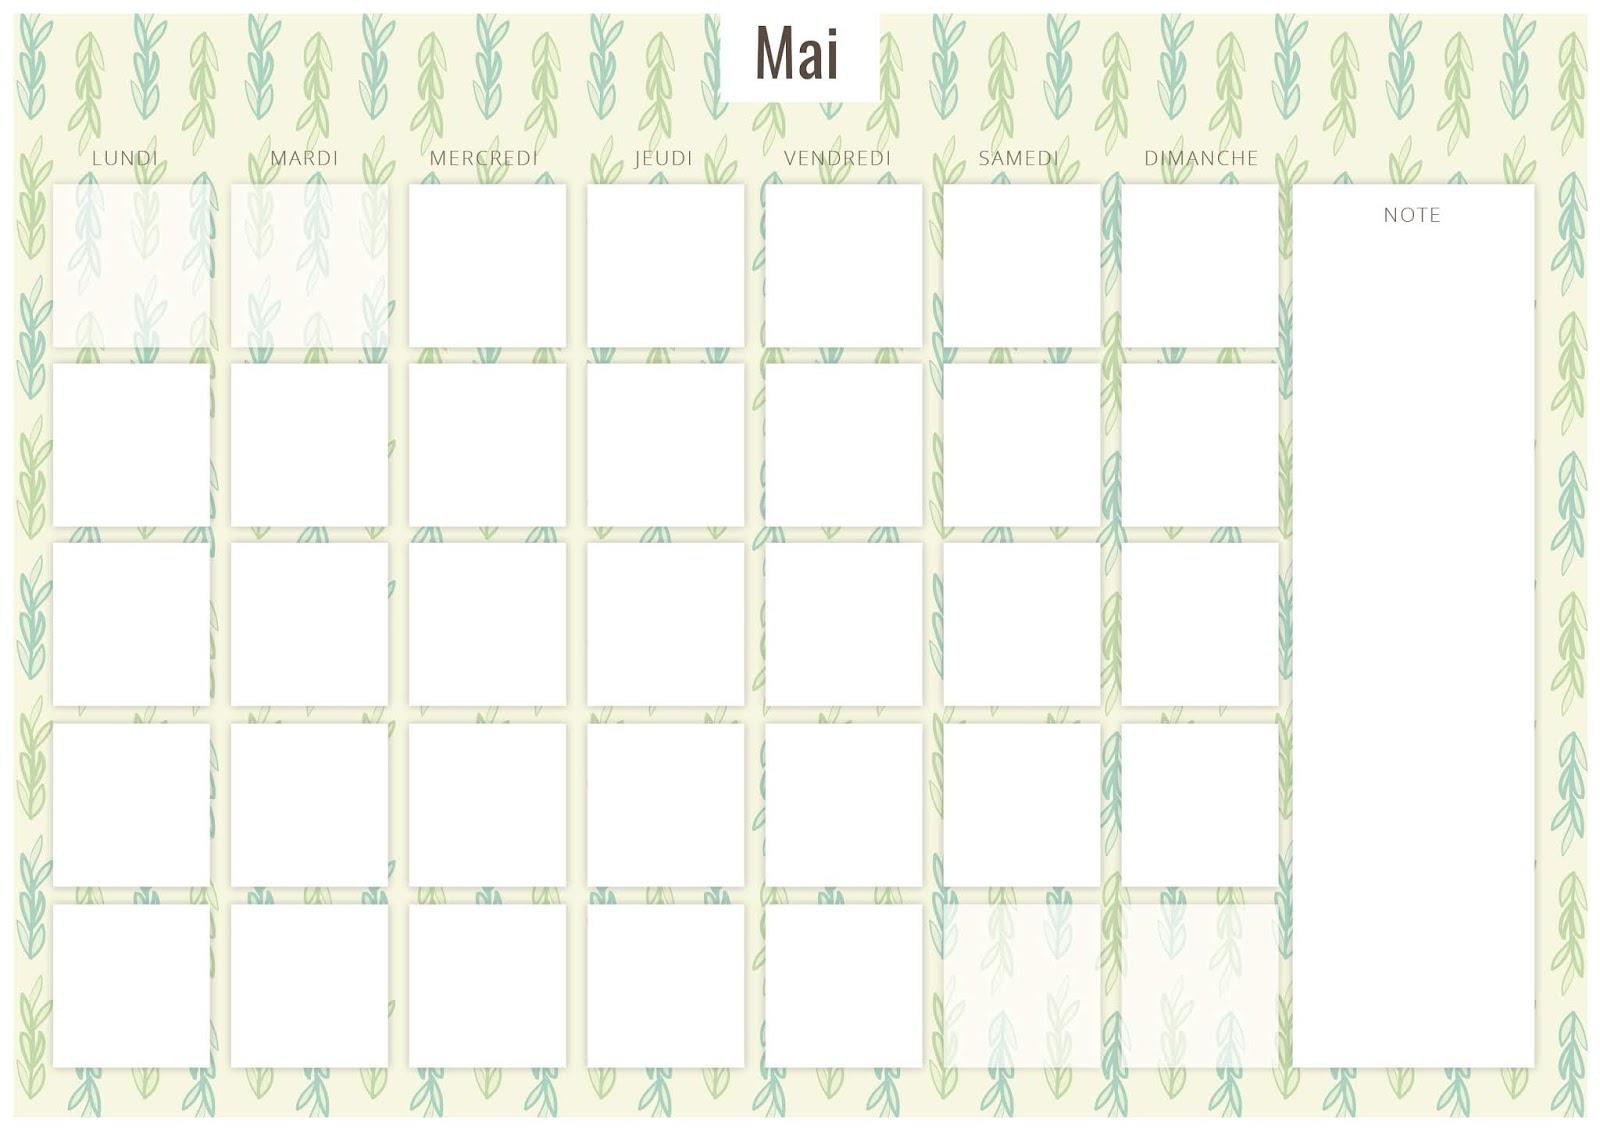 Calendrier Mensuel Juin 2019.Calendrier Mensuel Avril Mai Juin 2019